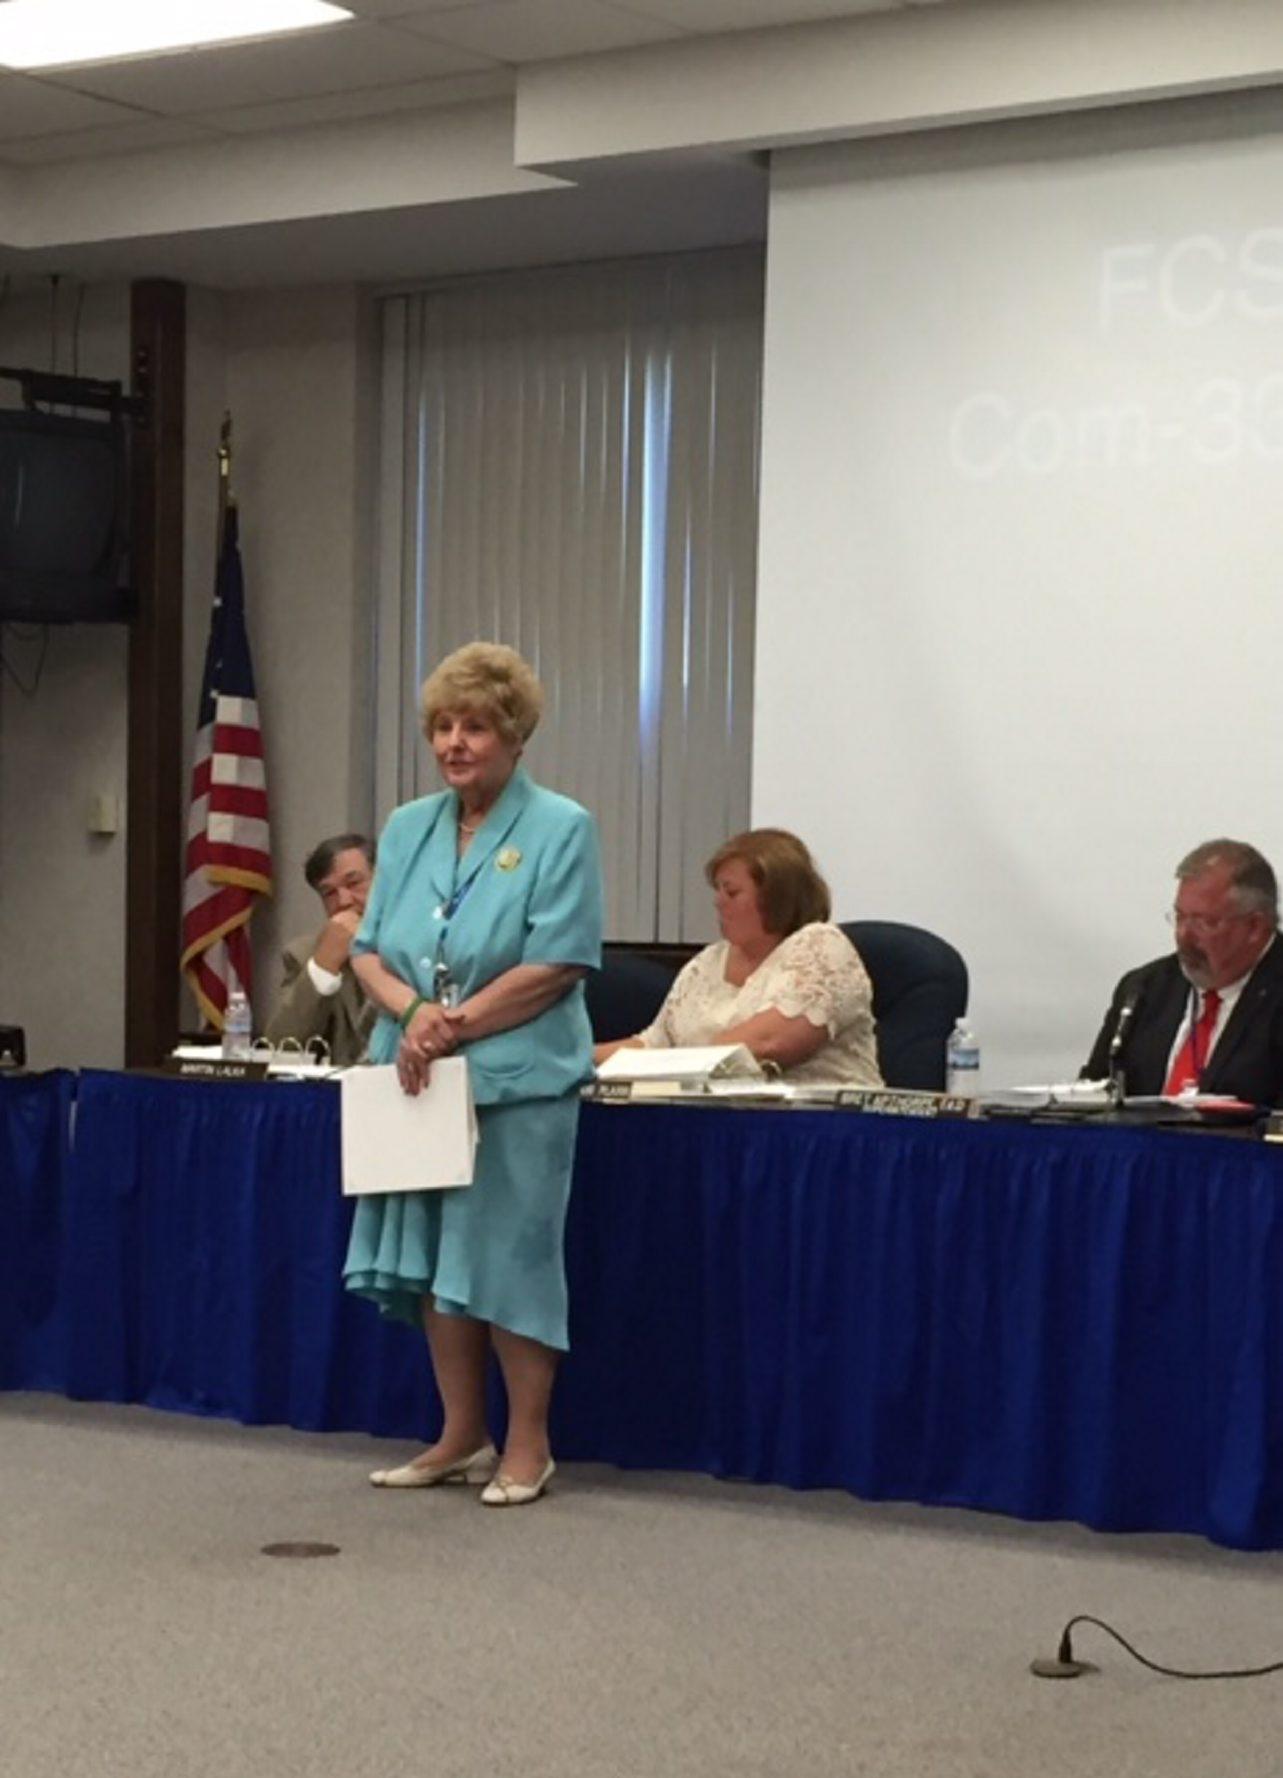 Retiring Big Tree Elementary Principal Joanne C. Saniewski is stepping down after 52 years in education.